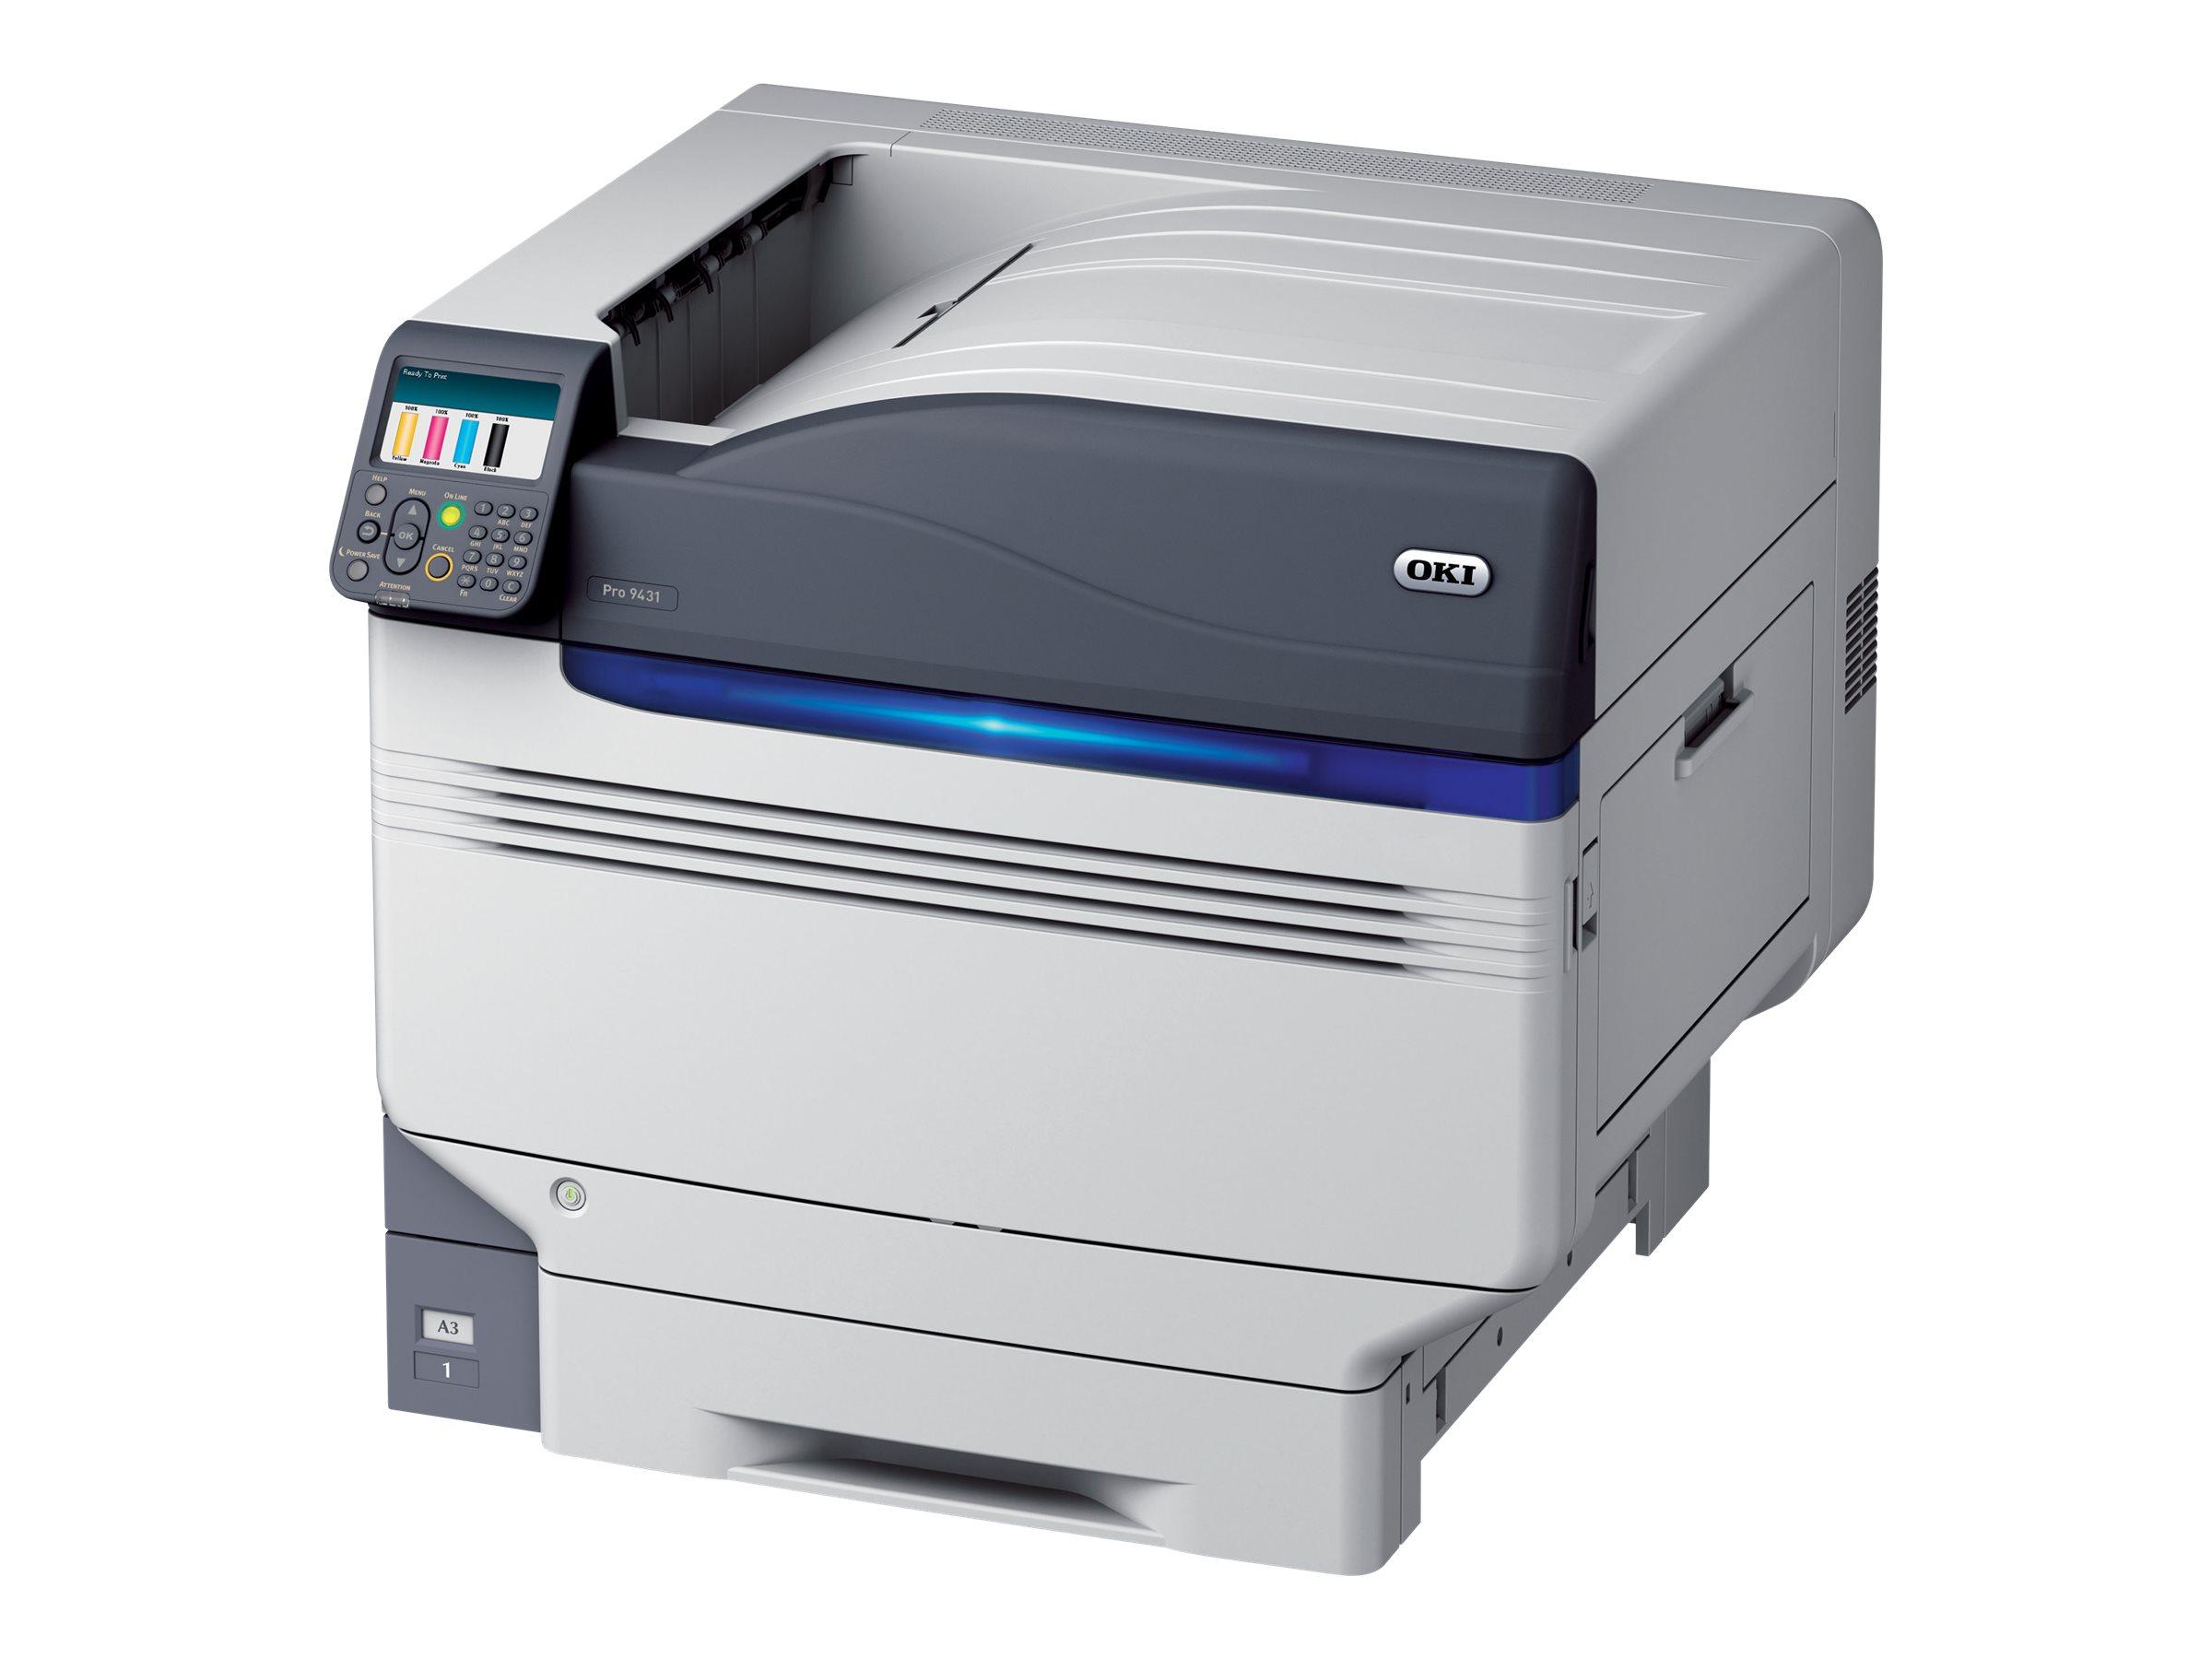 OKI PRO9431dn - Drucker - Farbe - Duplex - LED - A3